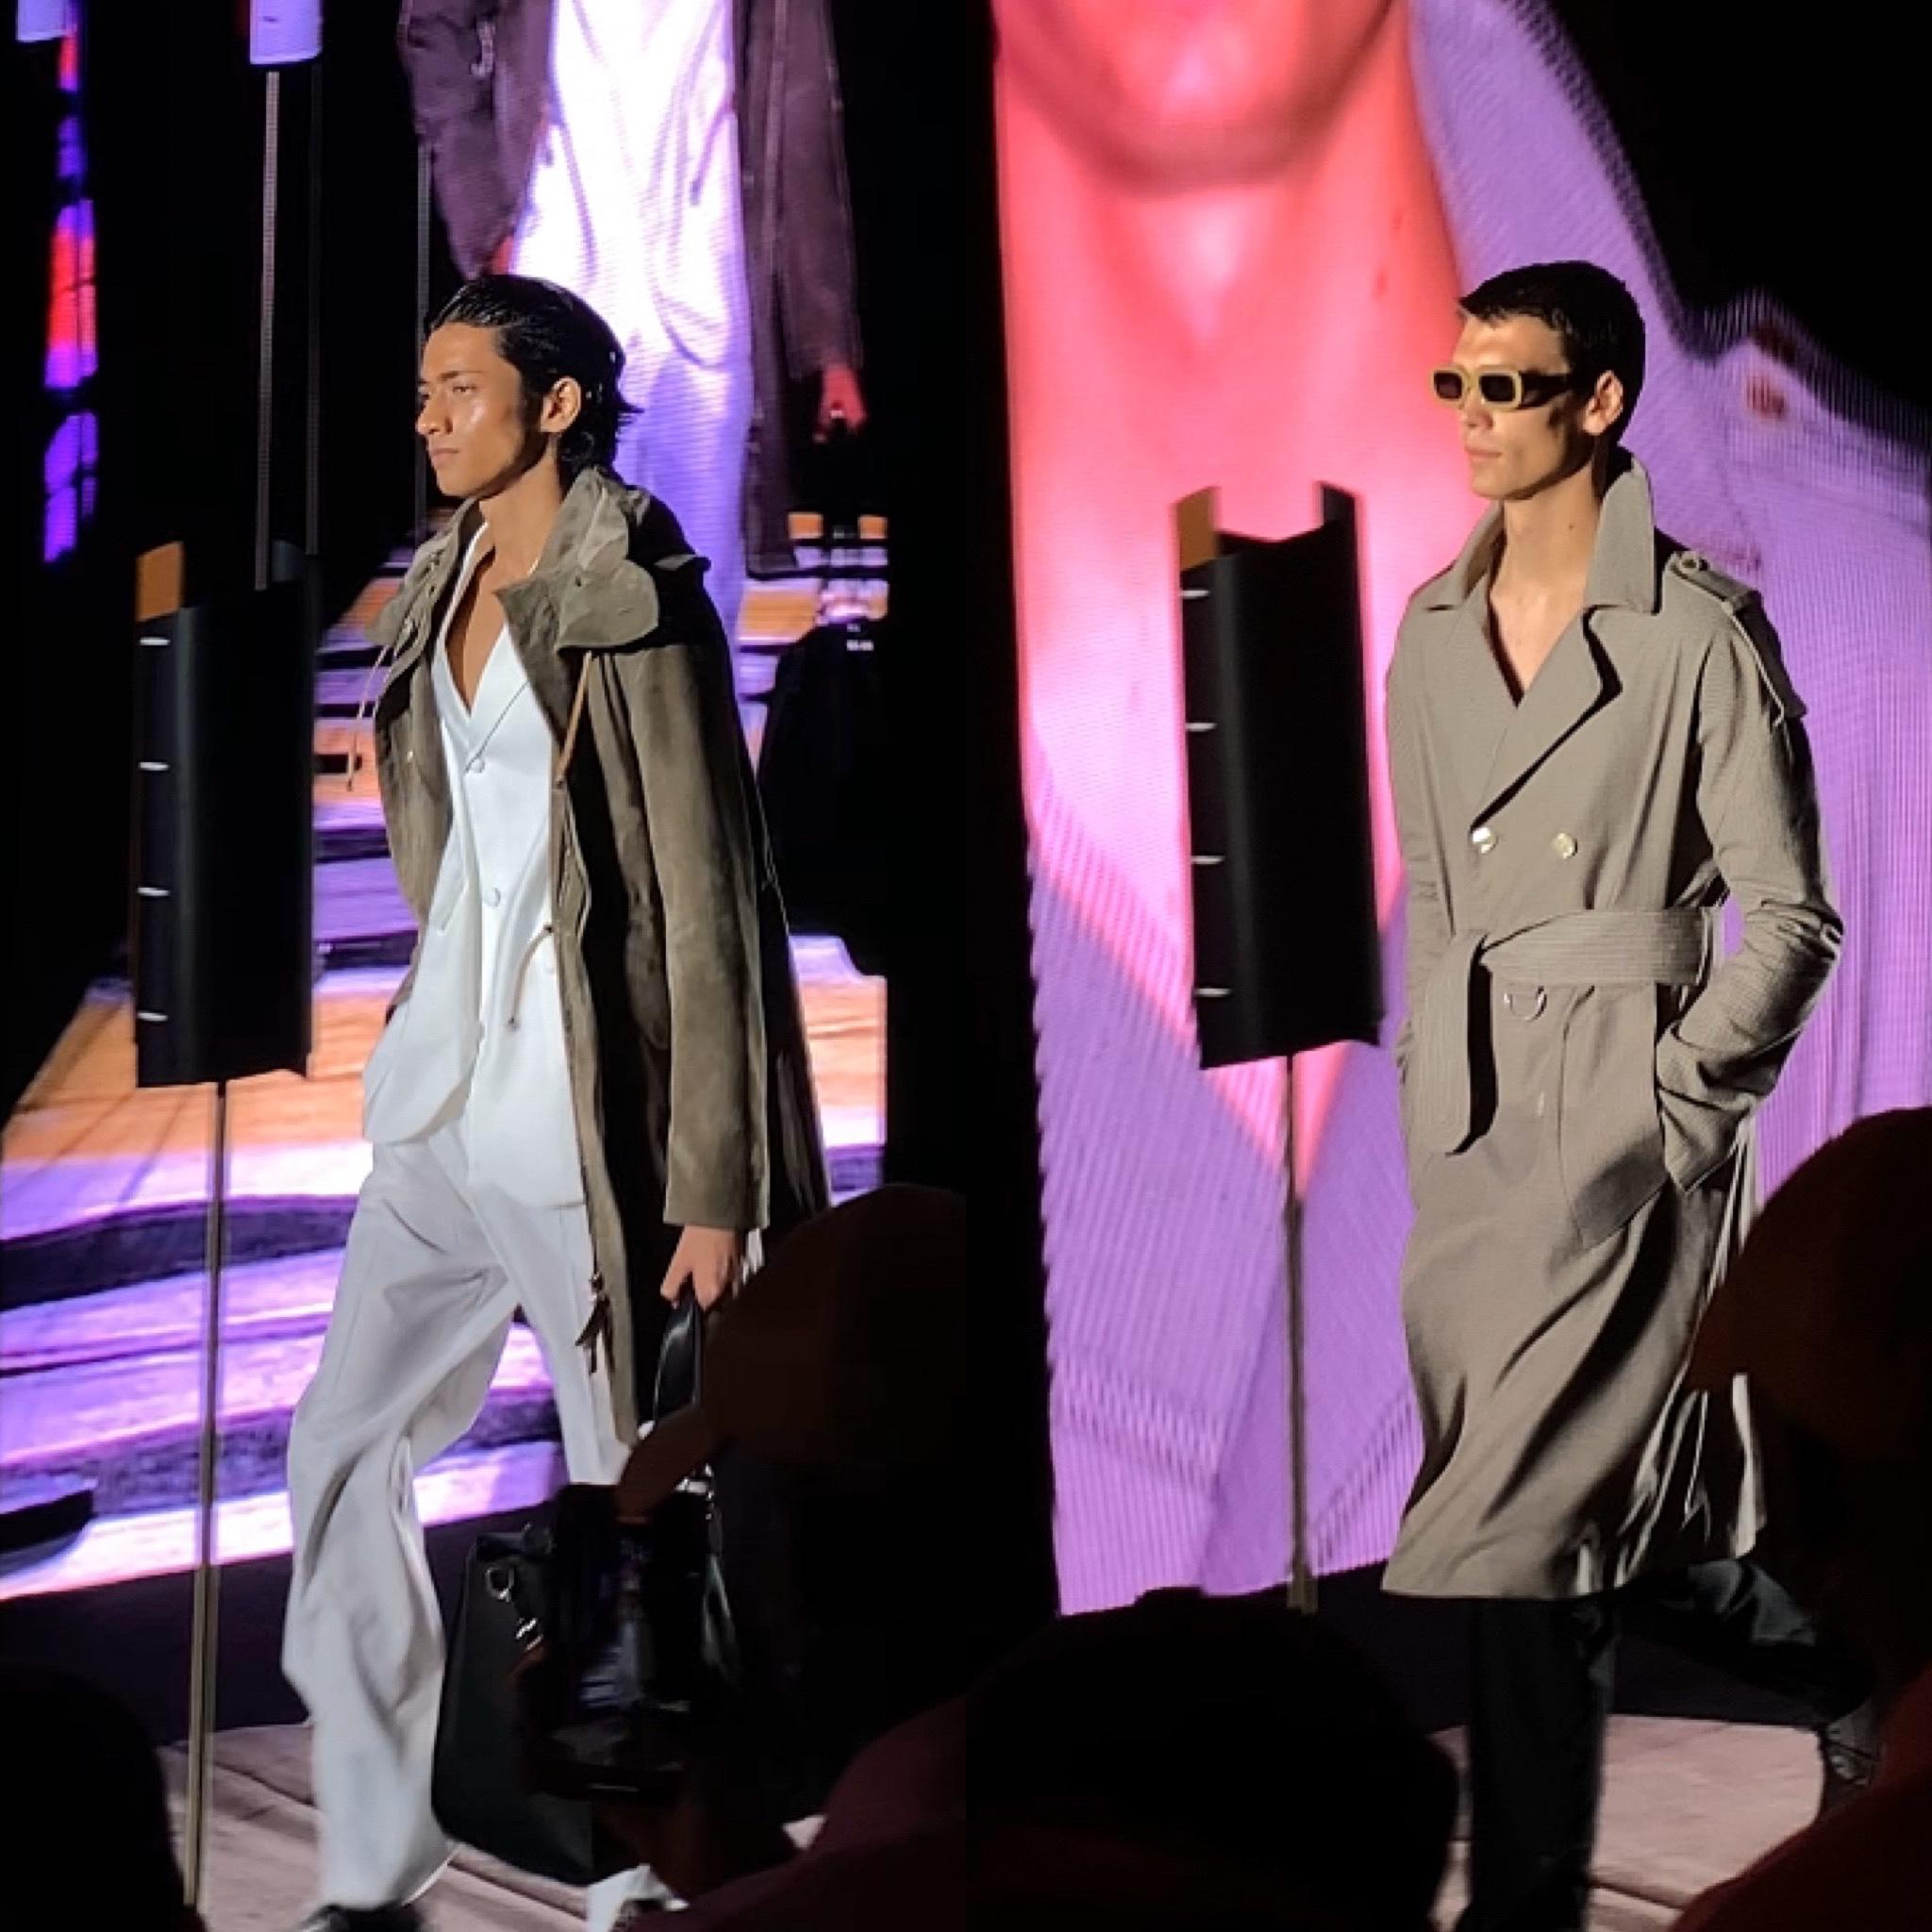 080-bcn-fashion-whynot-shopper-redactora-style-tendencias-pasarela-pablo-erroz-diseñadores